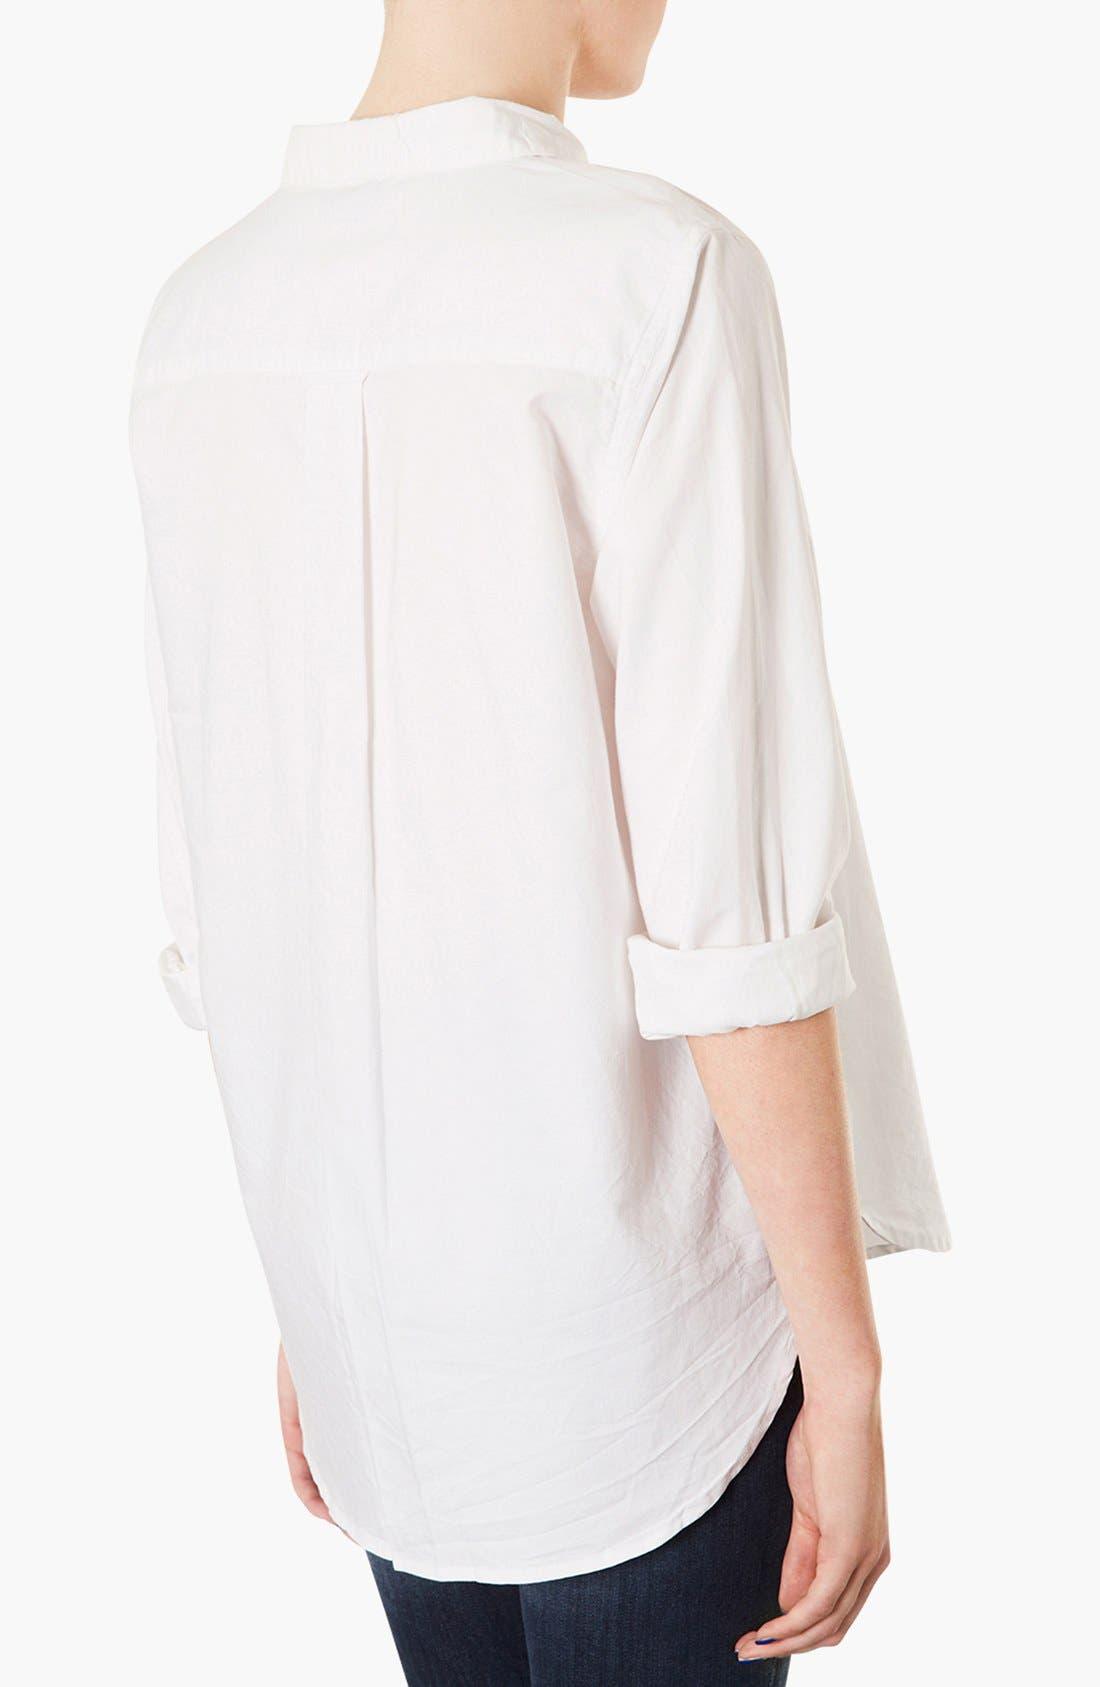 TOPSHOP, Woven Oxford Shirt, Alternate thumbnail 3, color, 100